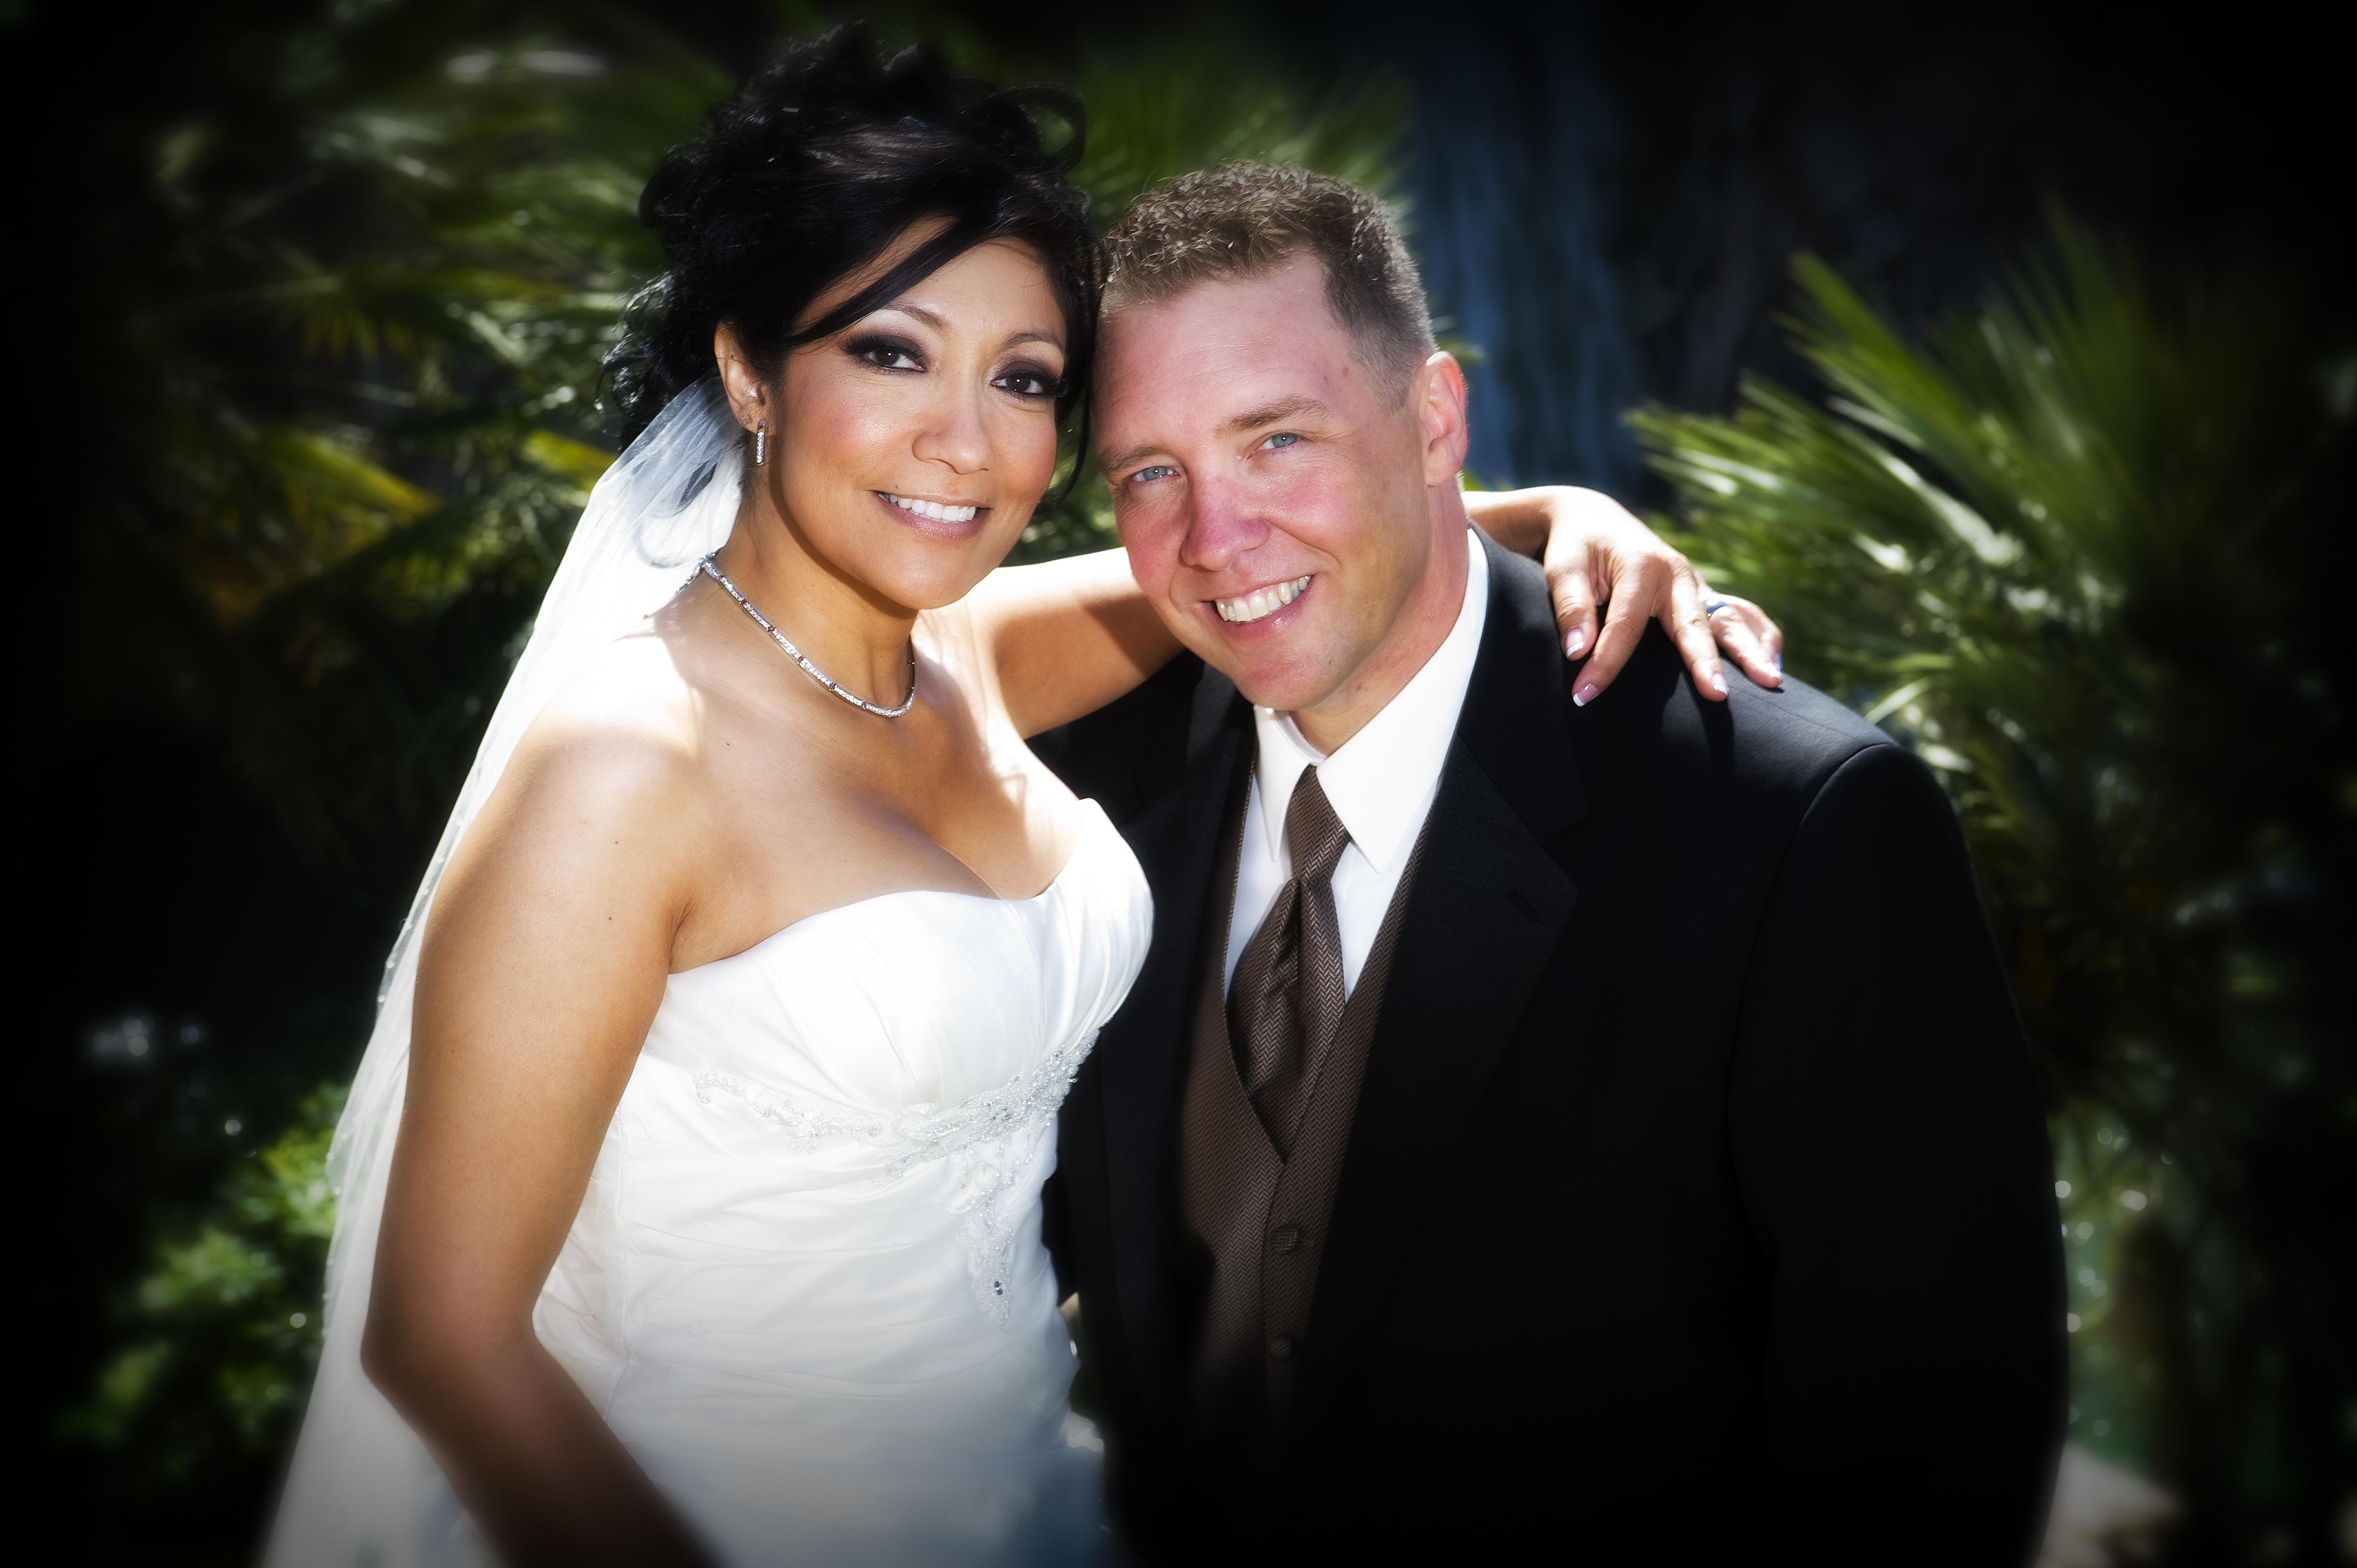 Beauty, Wedding Dresses, Fashion, white, black, dress, Bride, Groom, Hair, Water, Lnl photo